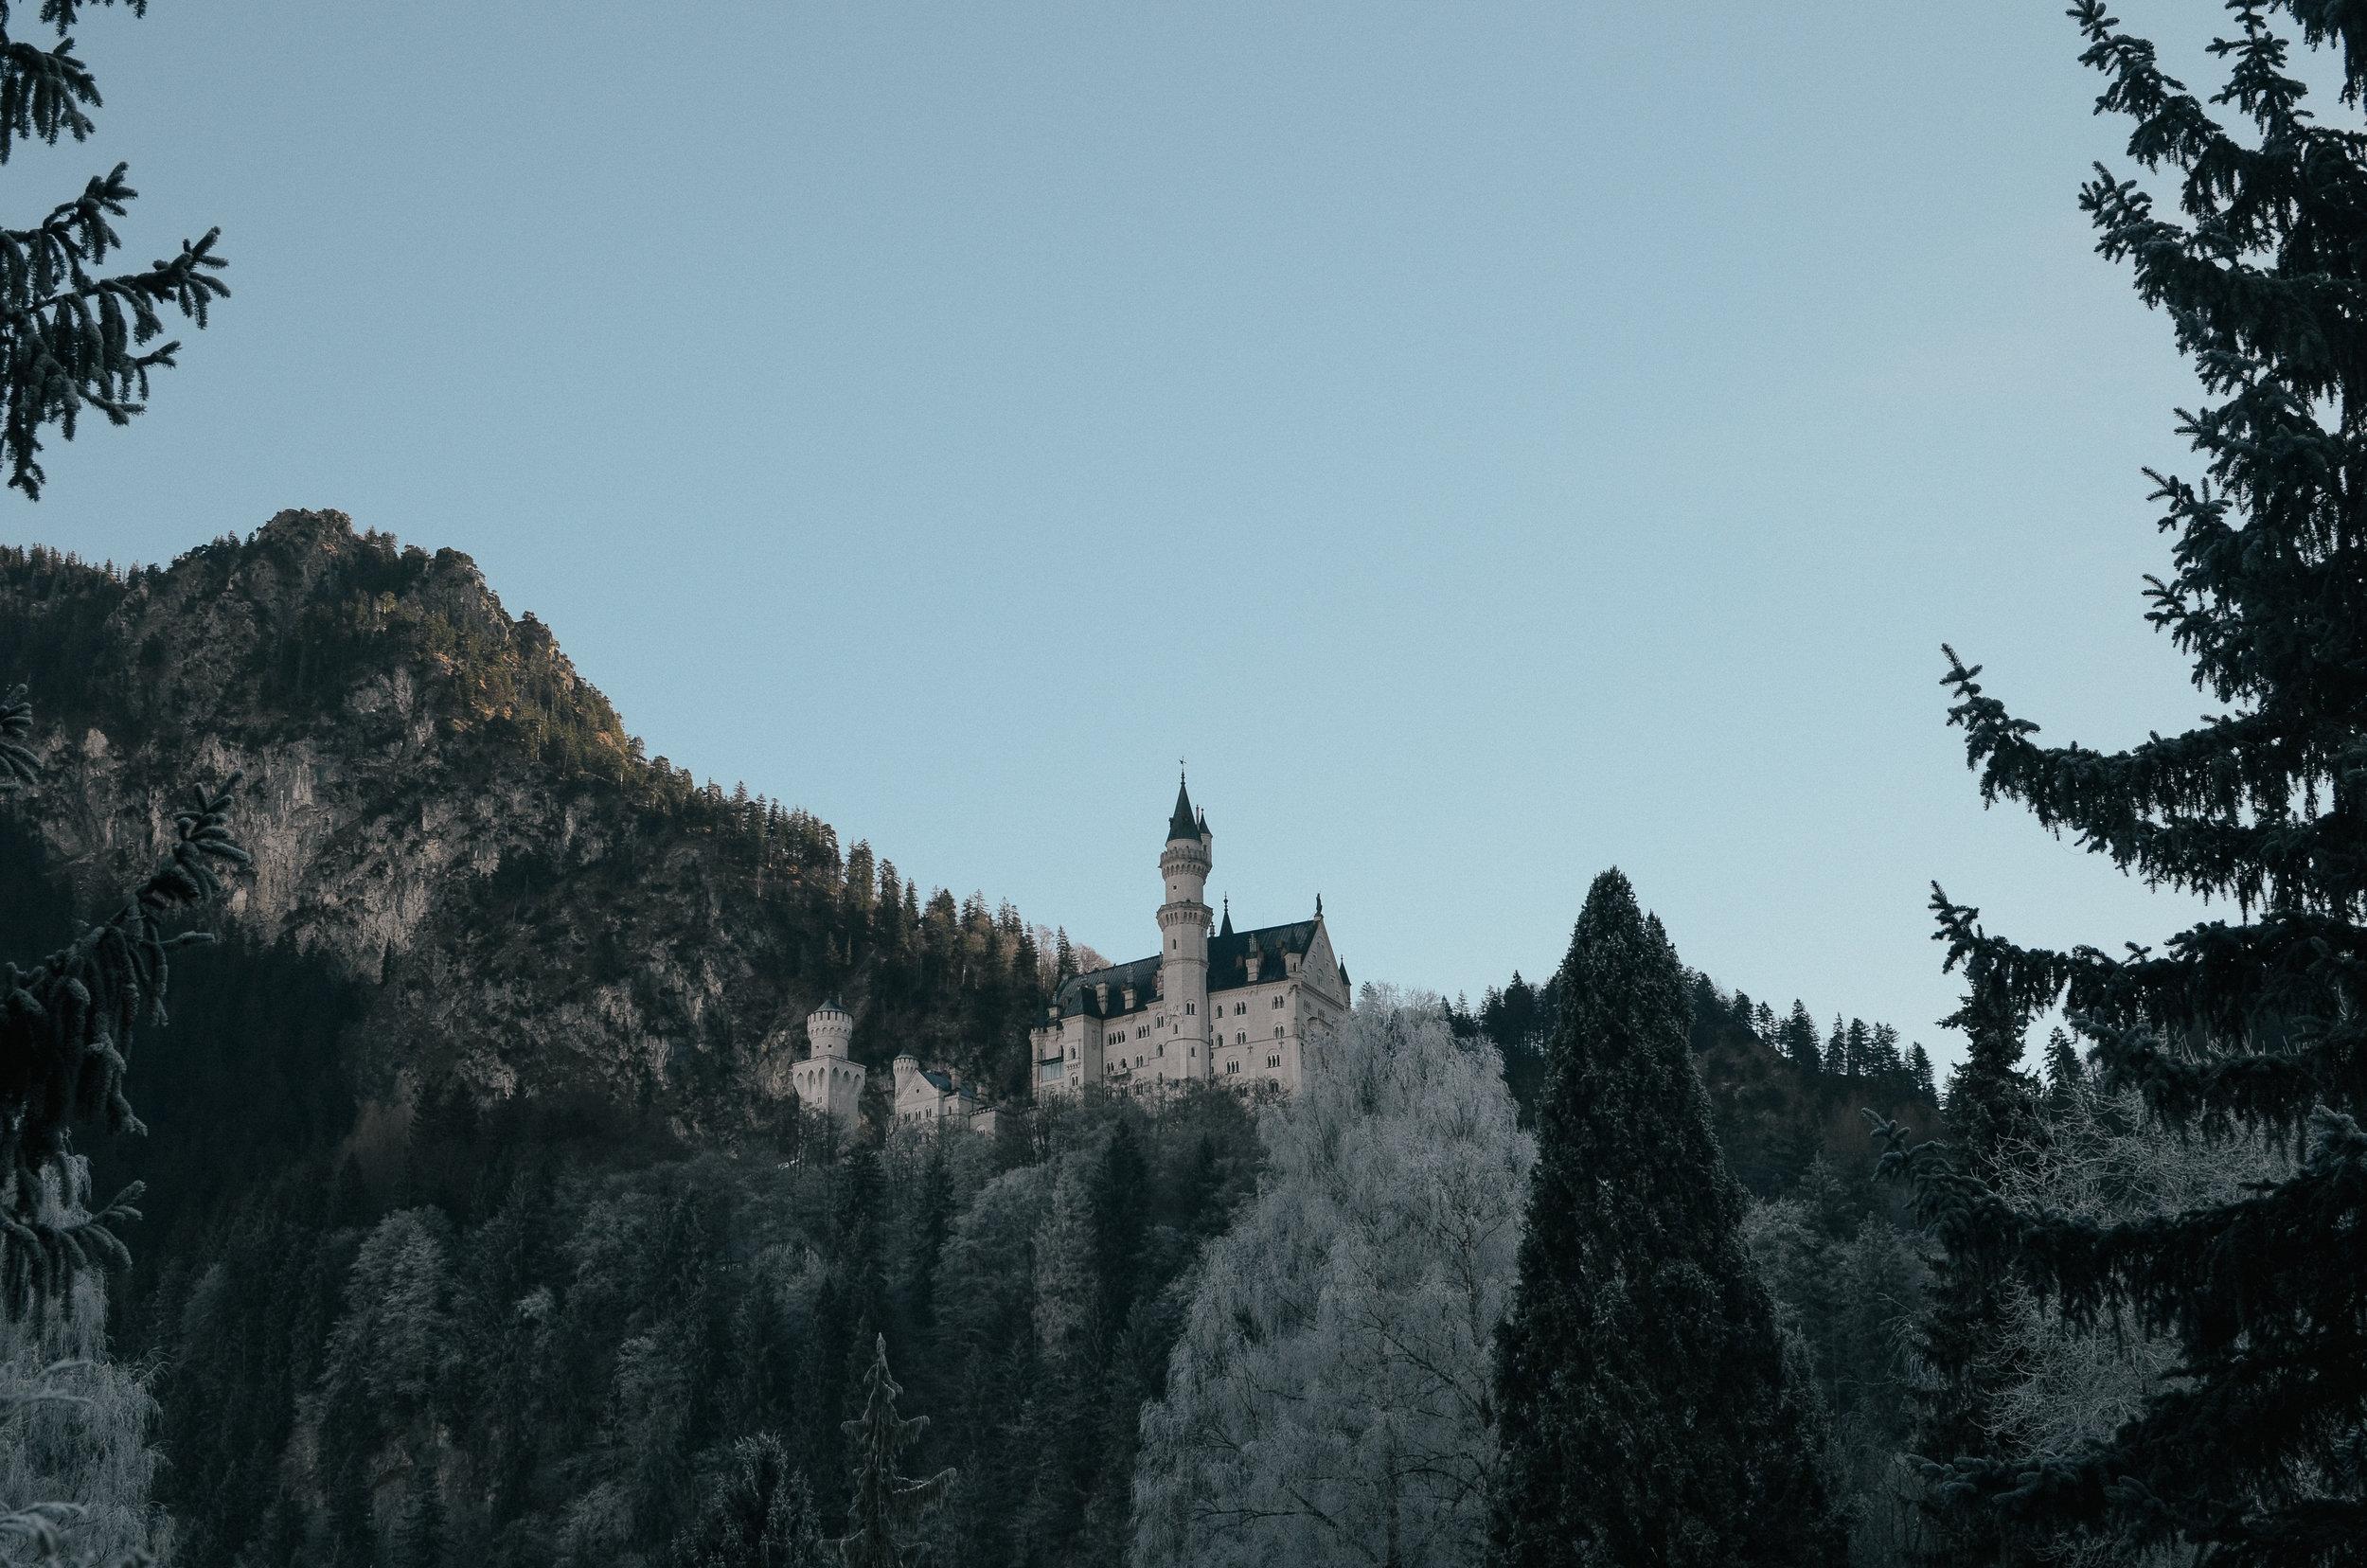 munich-germany-travel-guide-lifeonpine_DSC_0066.jpg